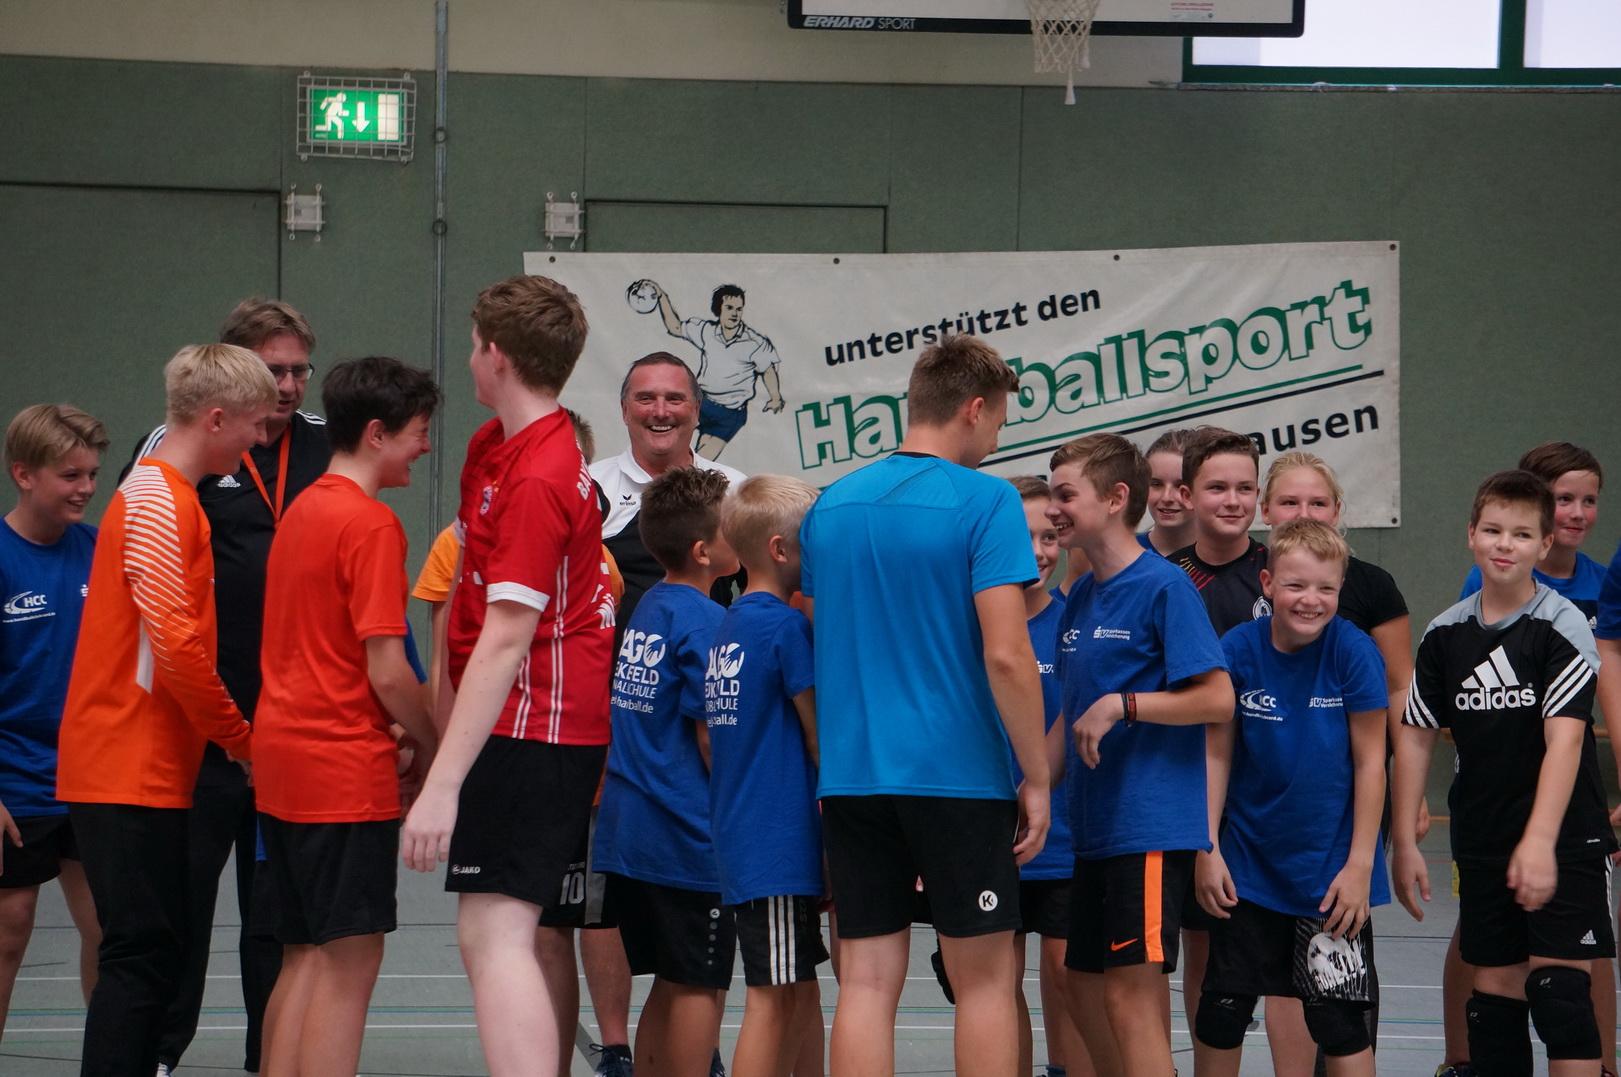 201808_Handballcamp_SDH_MG_295w